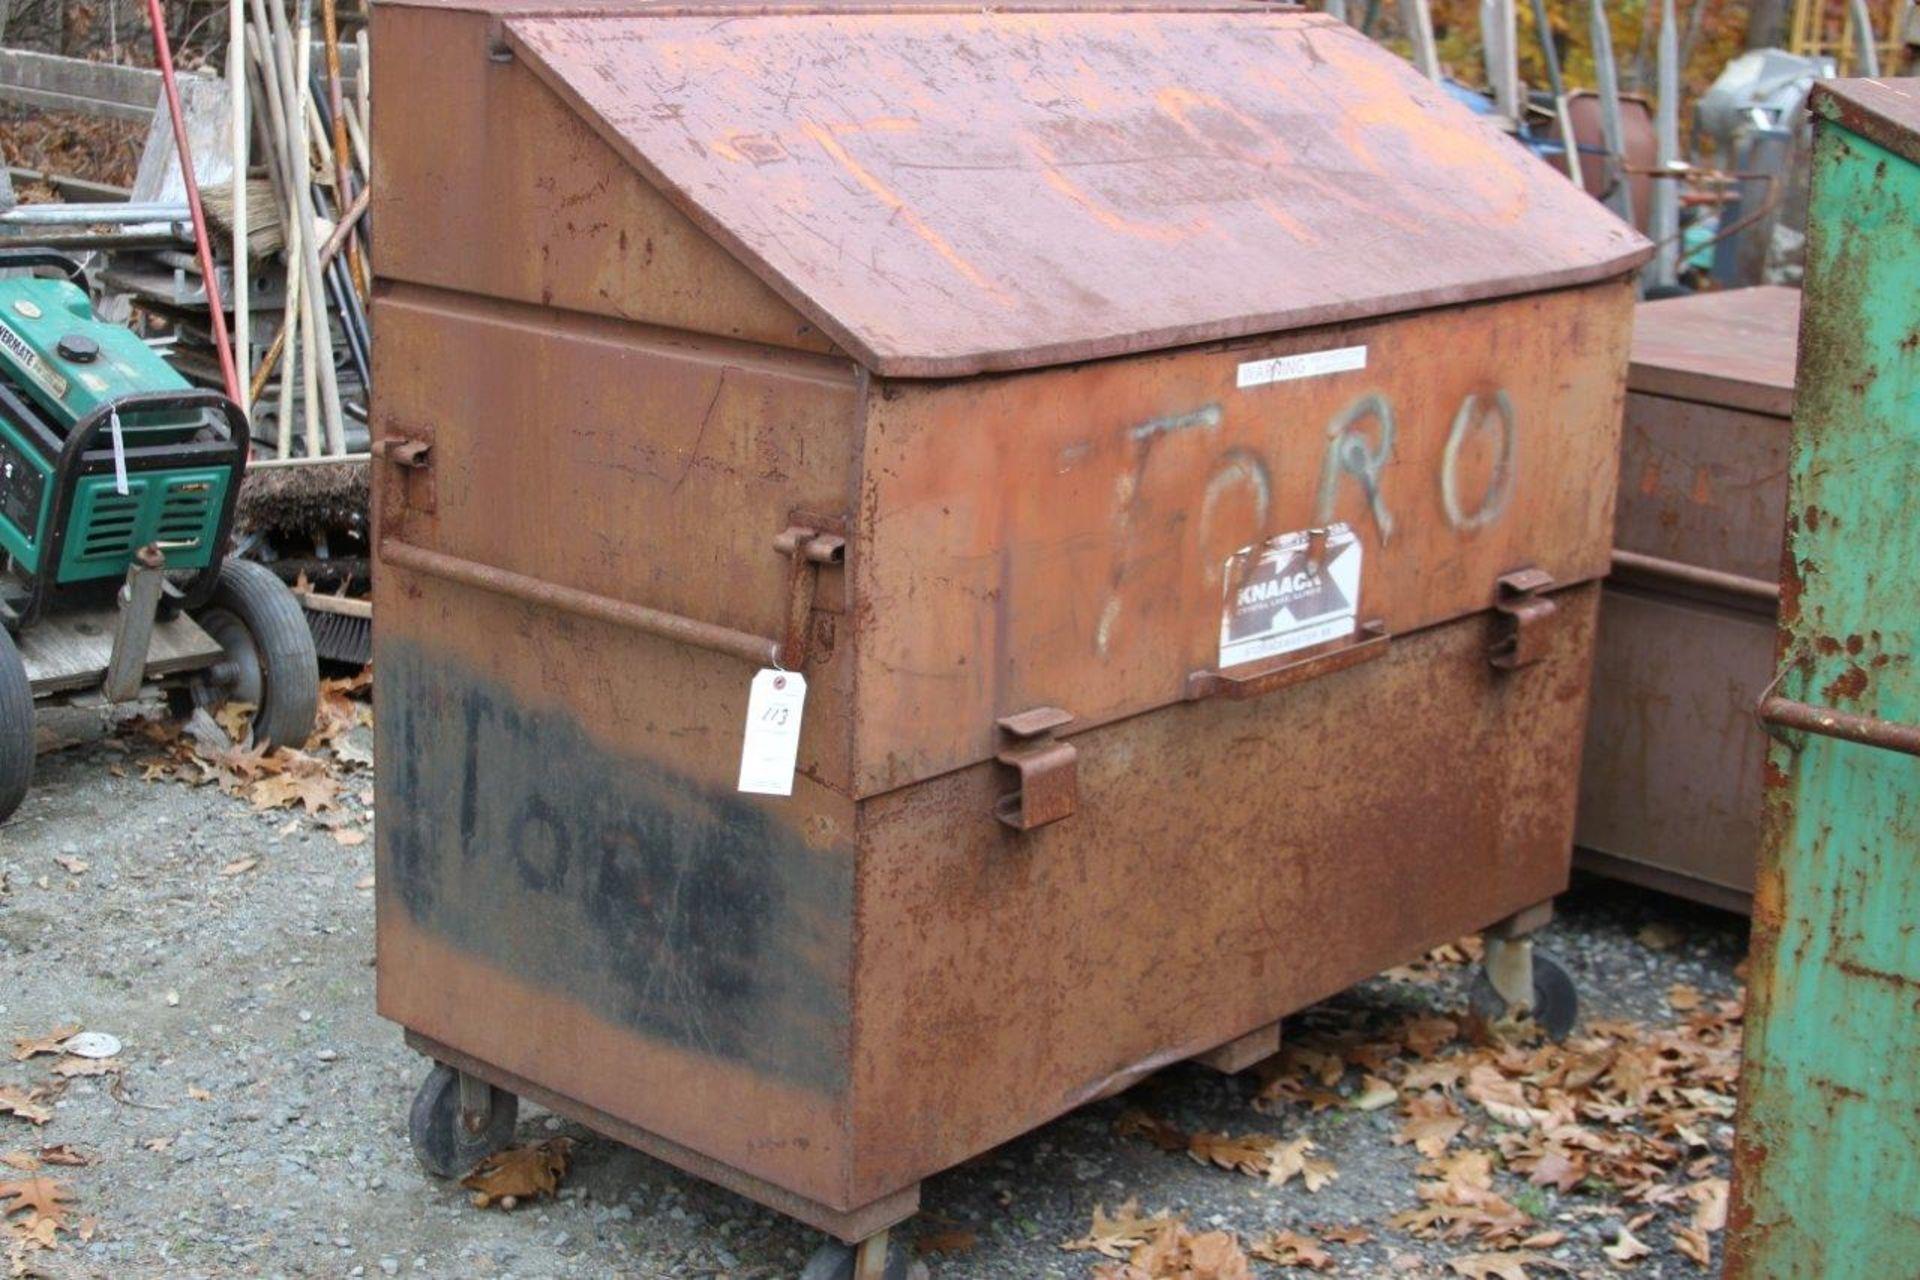 Lot 113 - Knaack Storagemaster 89 Rolling Job Box